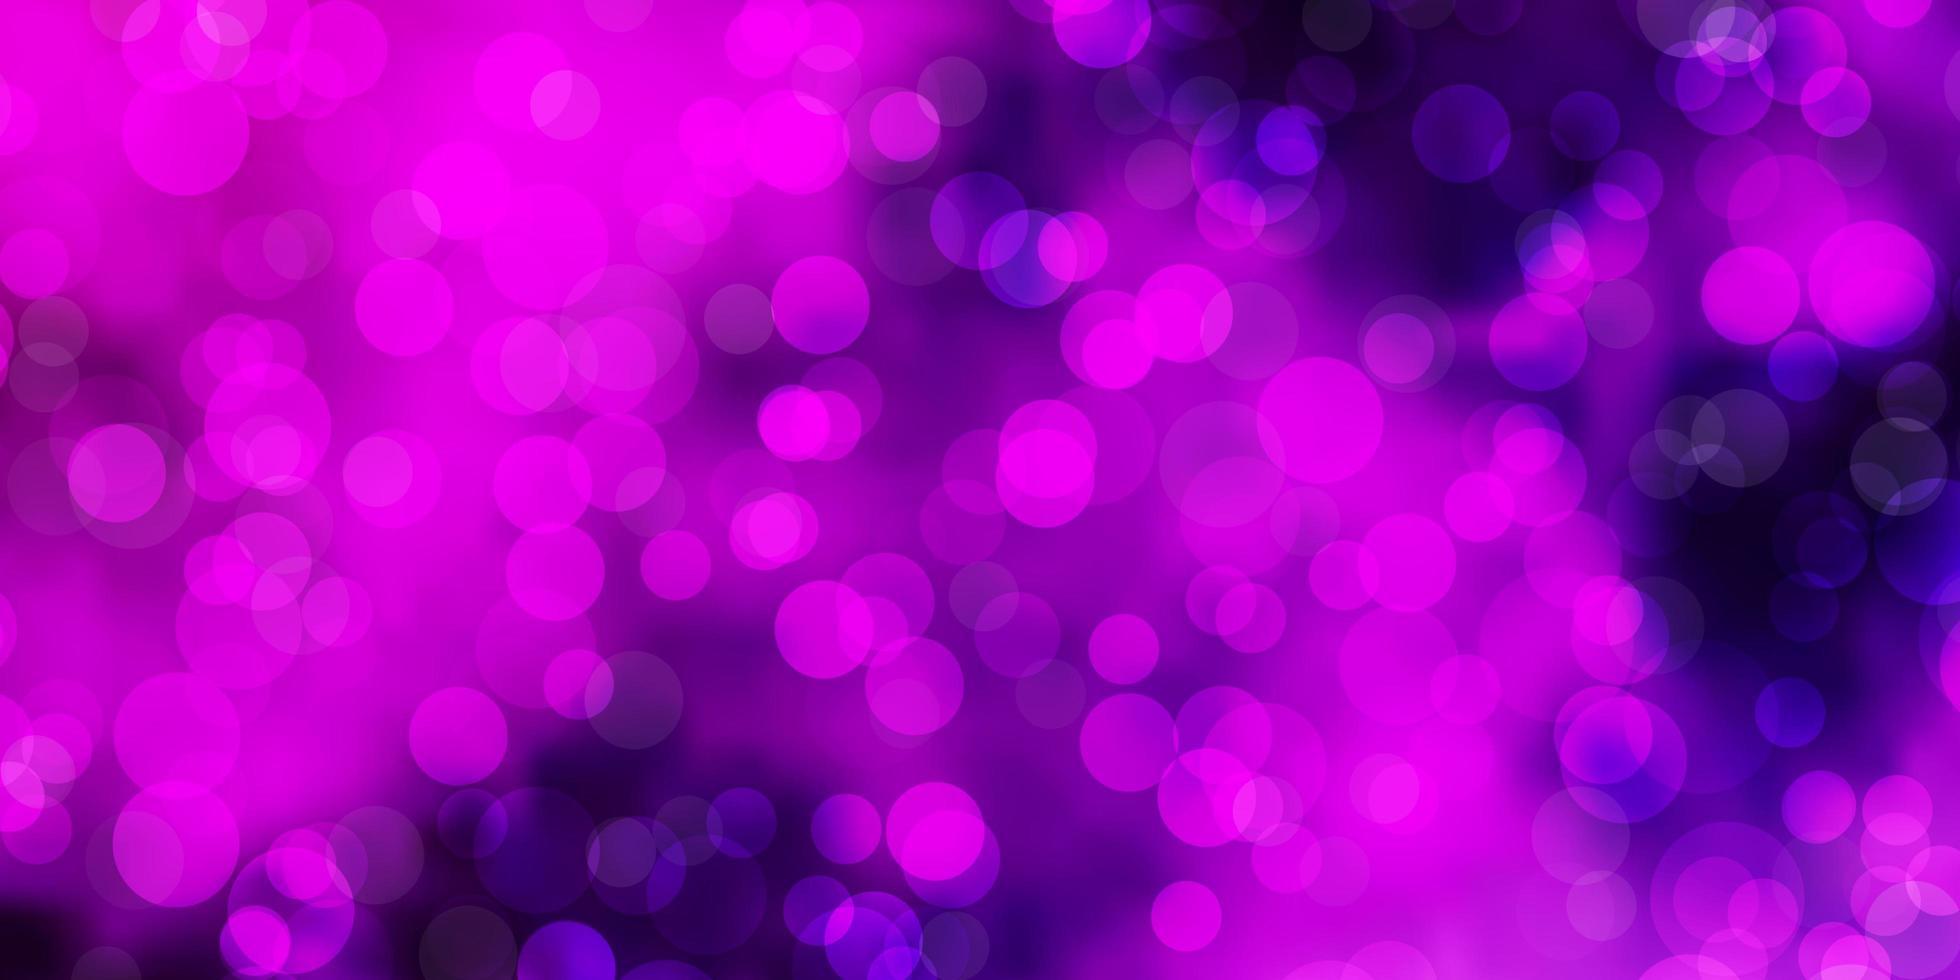 Fondo de vector violeta, rosa claro con manchas.